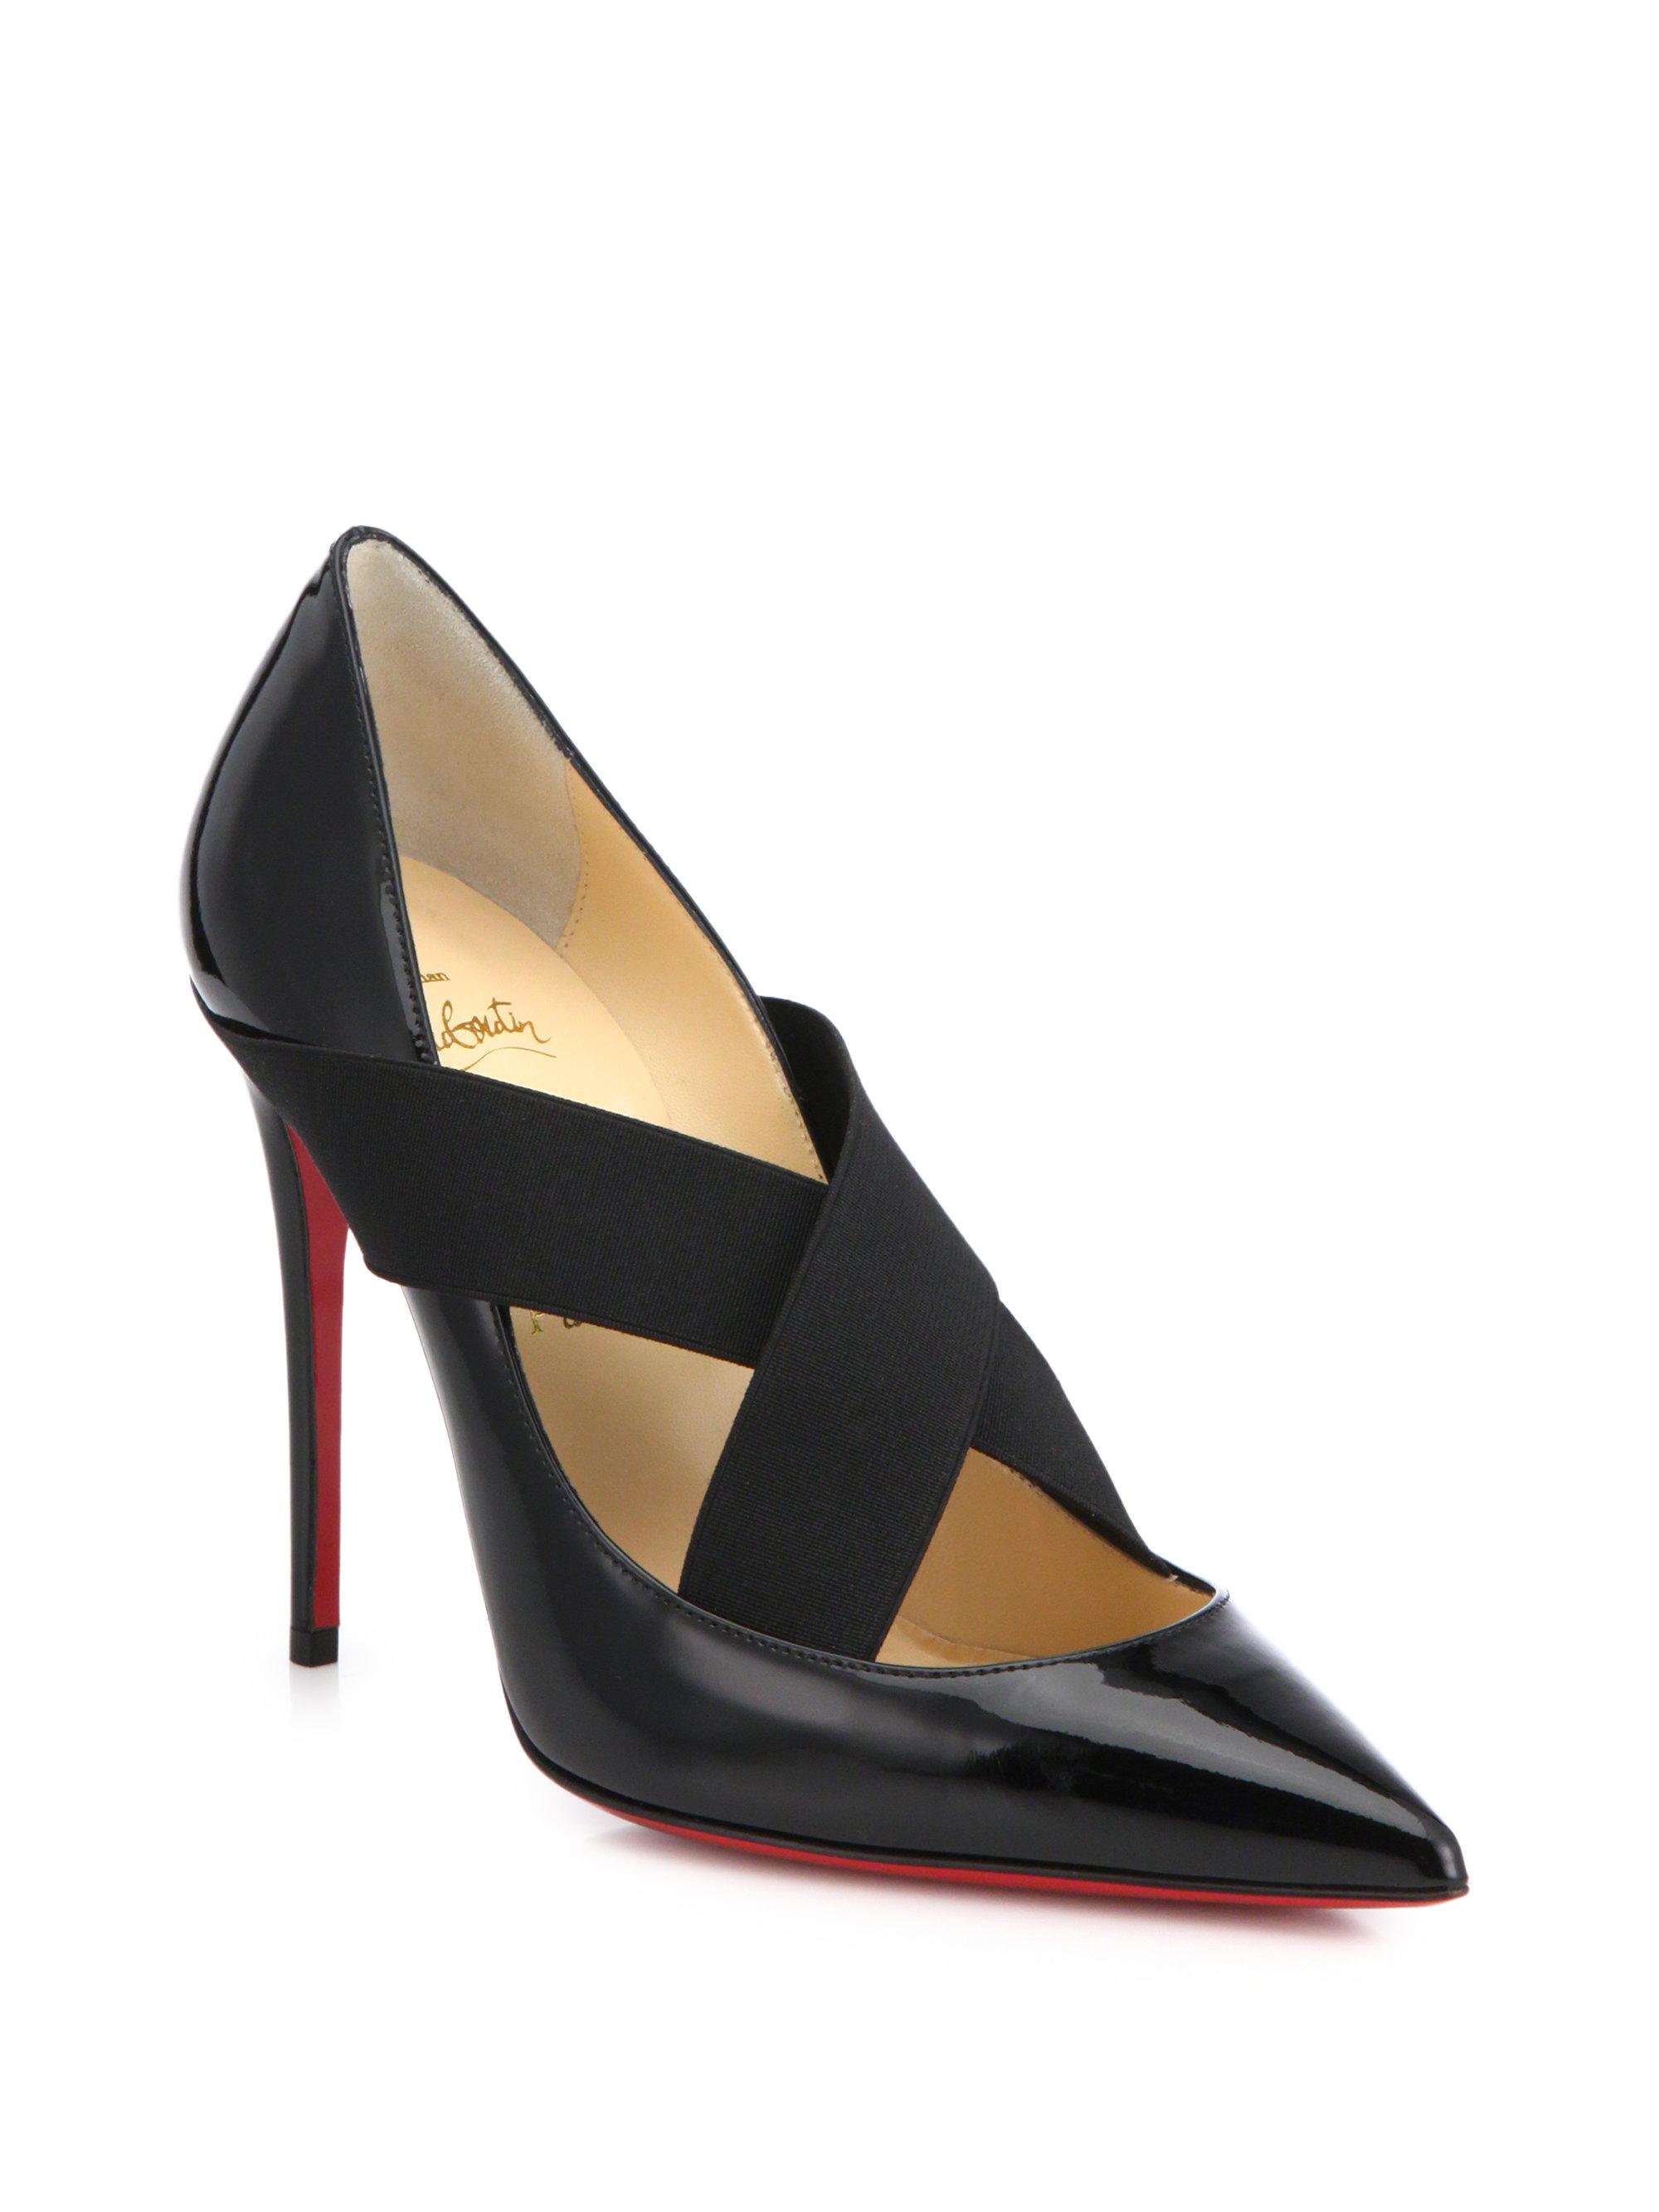 christian louboutin replica heels - christian louboutin peep-toe pumps Black mesh patent accent | The ...